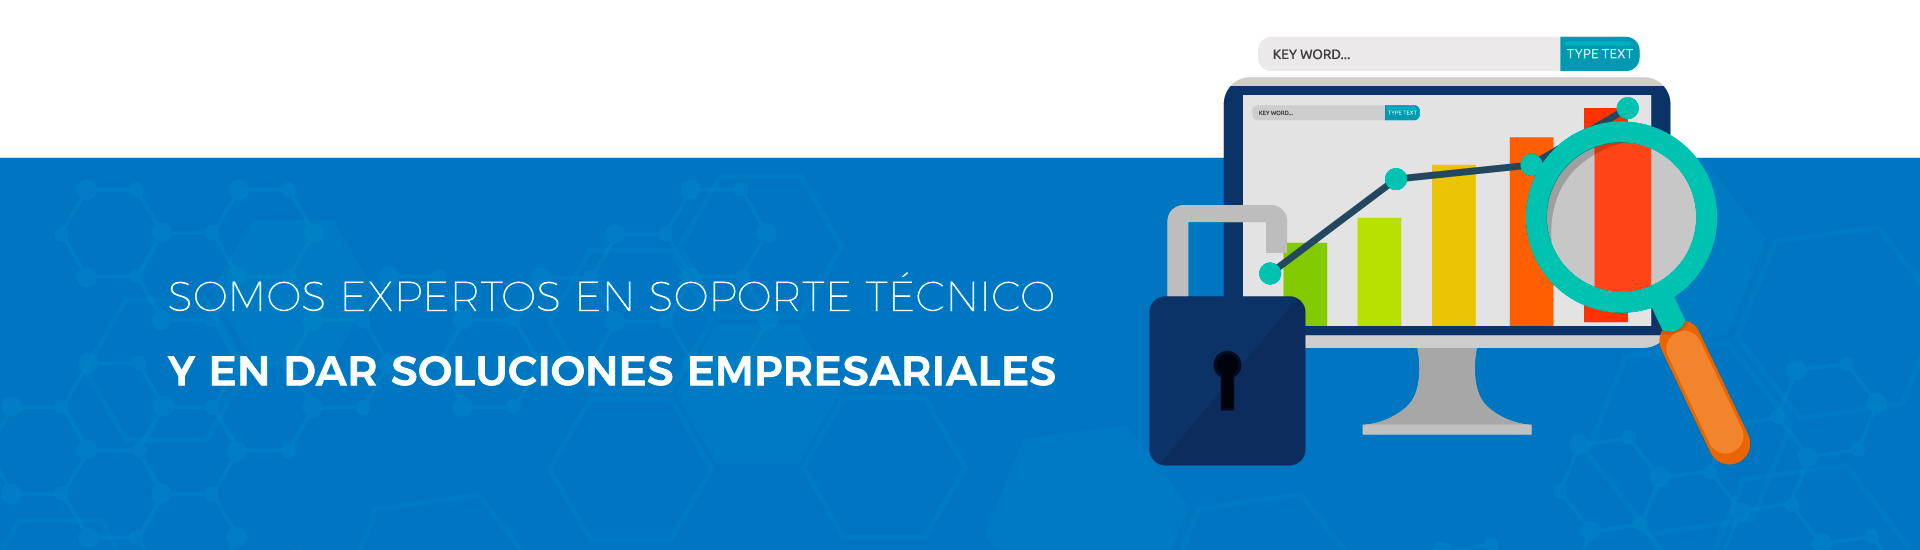 Soporte Tecnico de Computo Para Empresas Naucalpan de Juarez 5